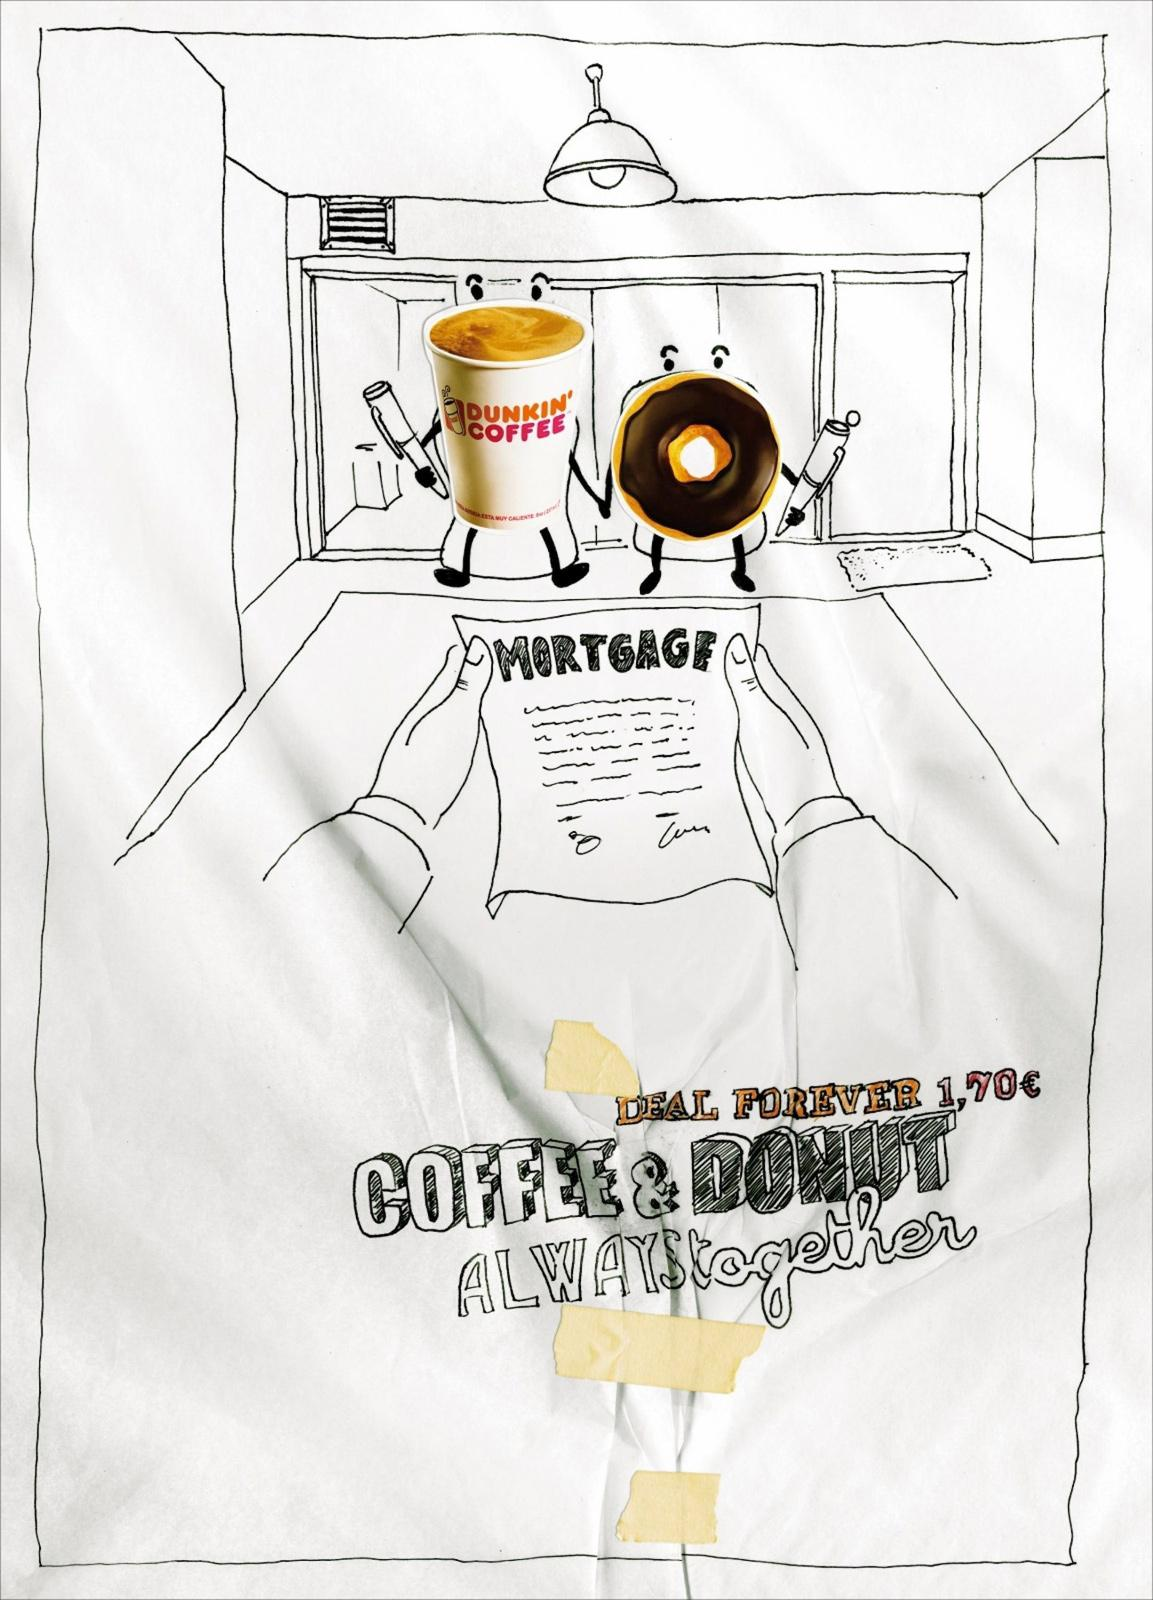 Dunkin' Donuts Print Ad -  Mortgage